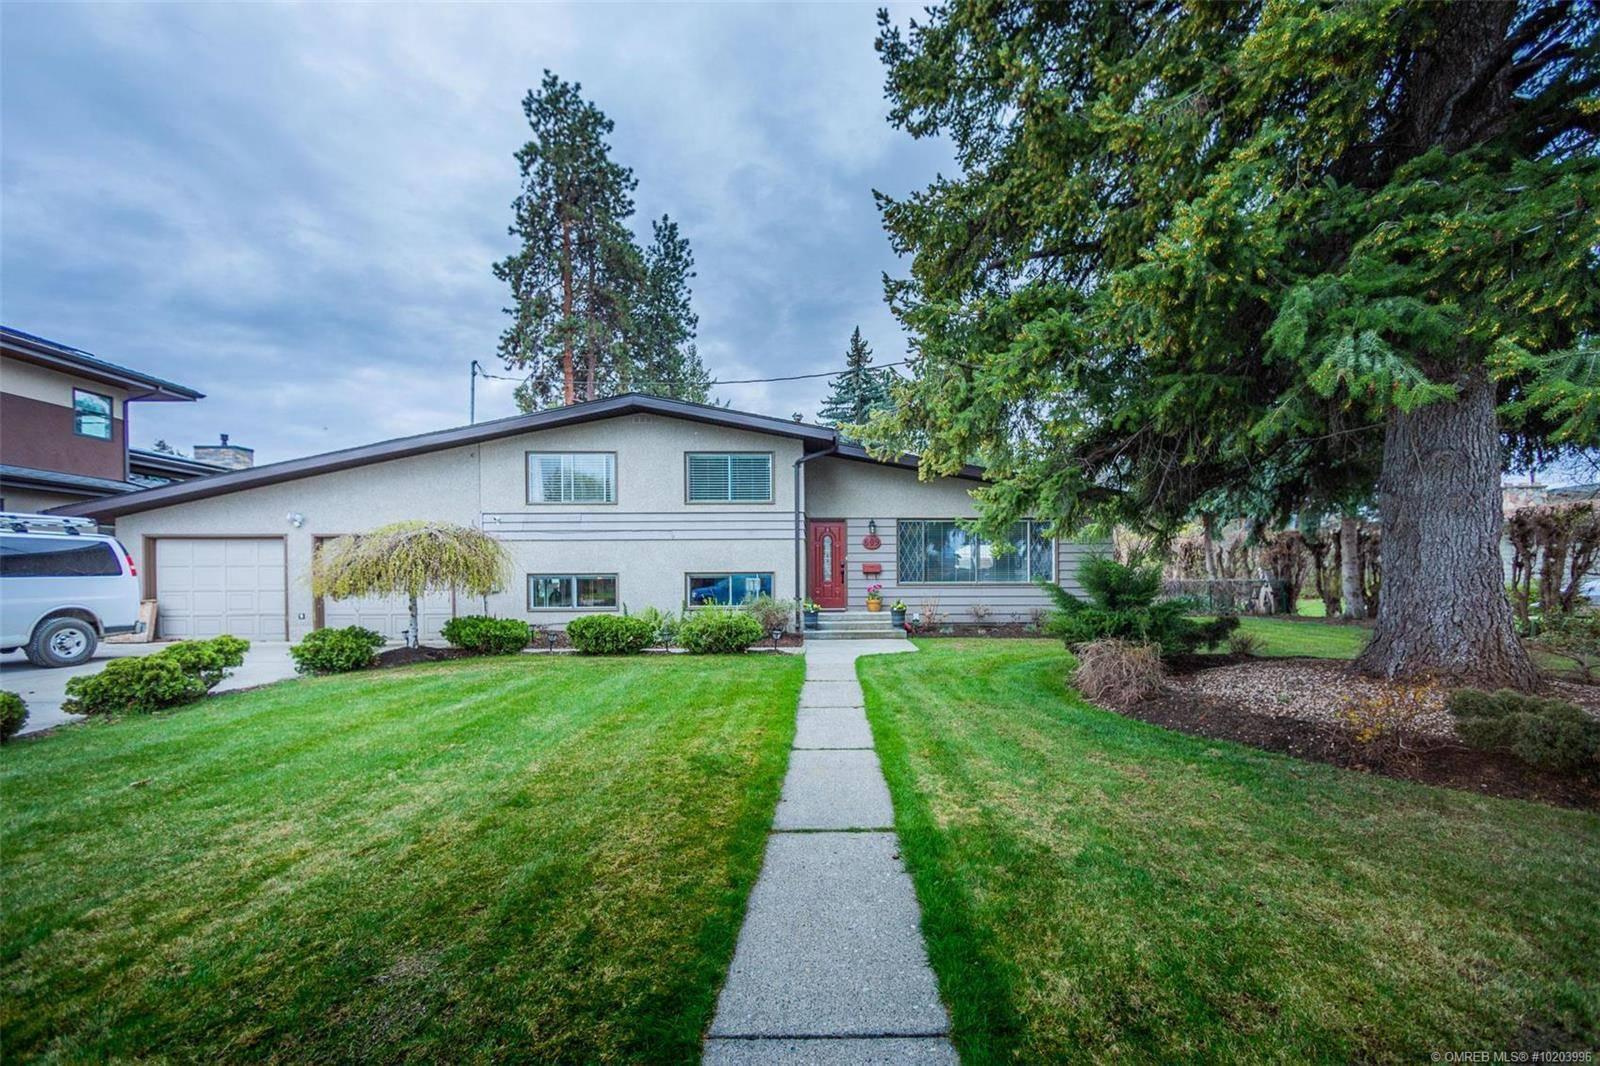 House for sale at 609 Greene Rd Kelowna British Columbia - MLS: 10203996